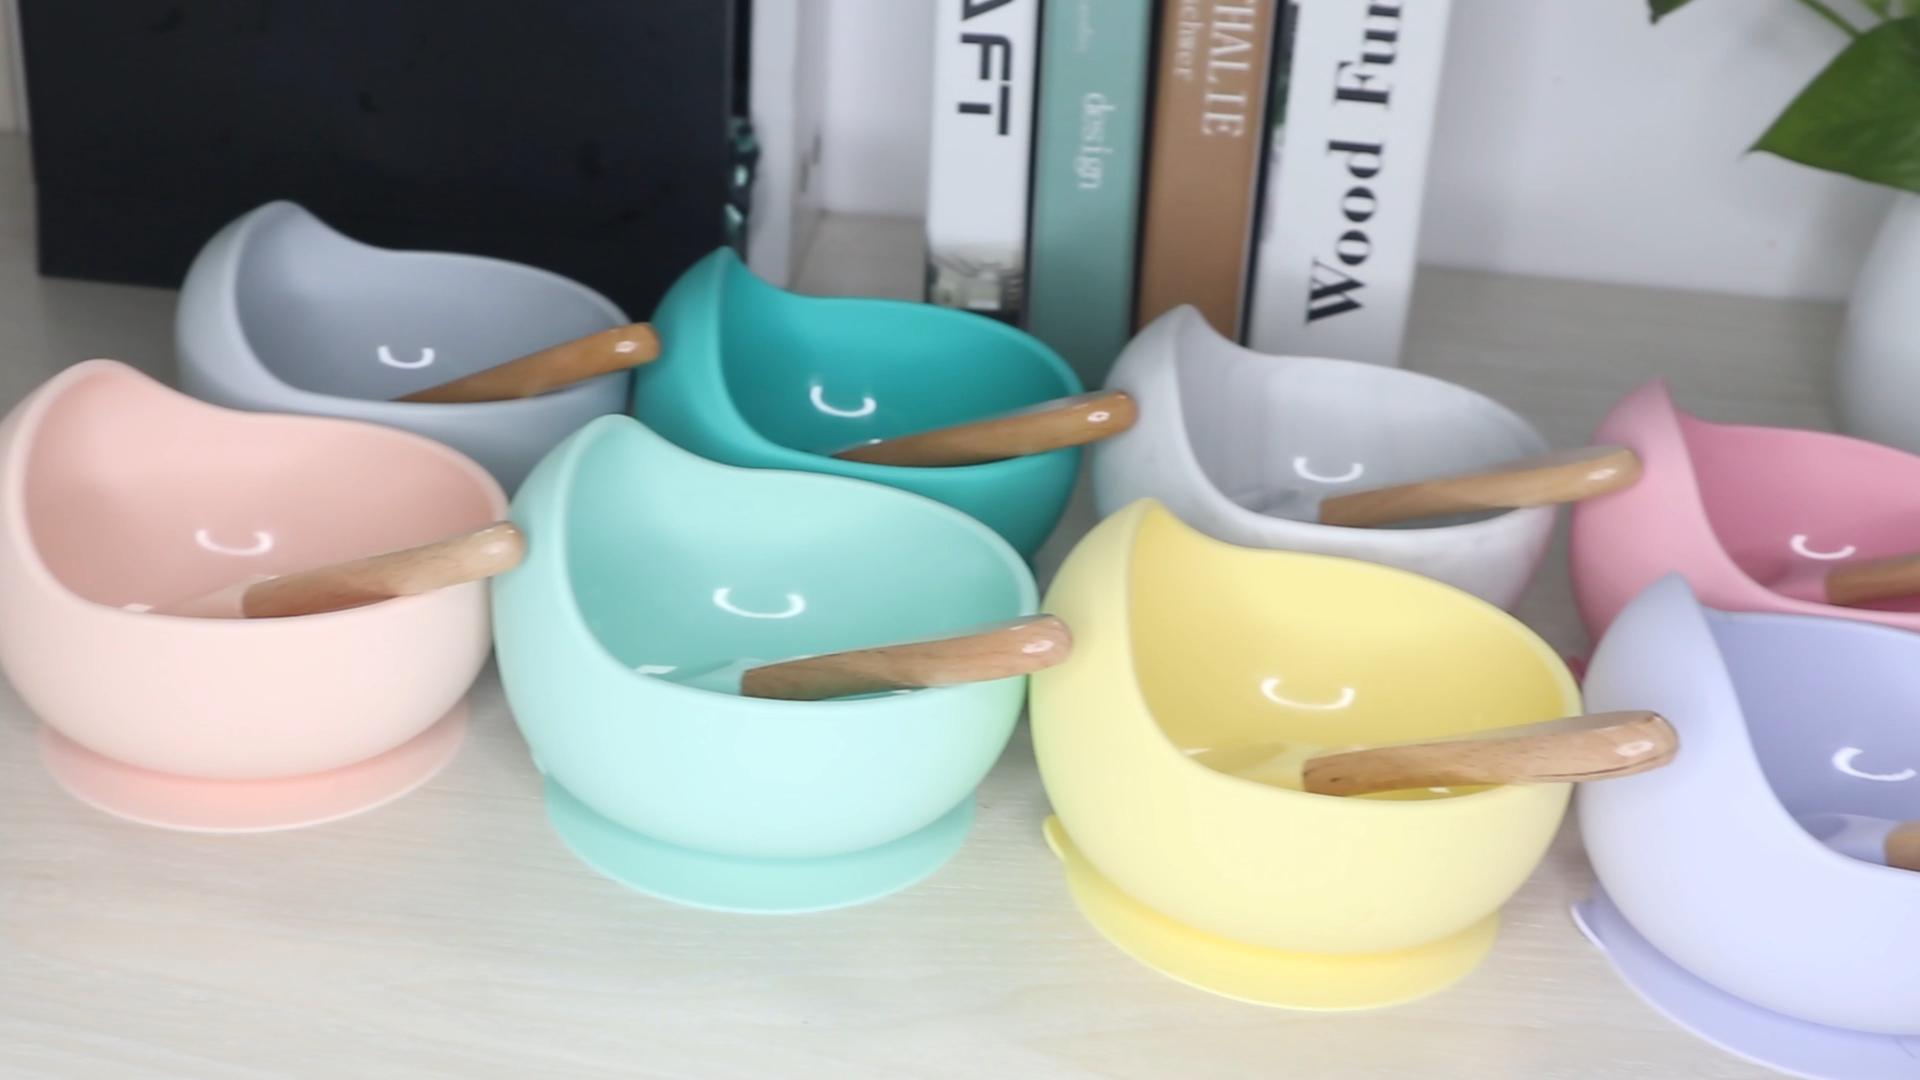 BPA משלוח ידידותי לסביבה צבעוני כלי שולחן סיליקון תינוק האכלת יניקה קערה עם כפית